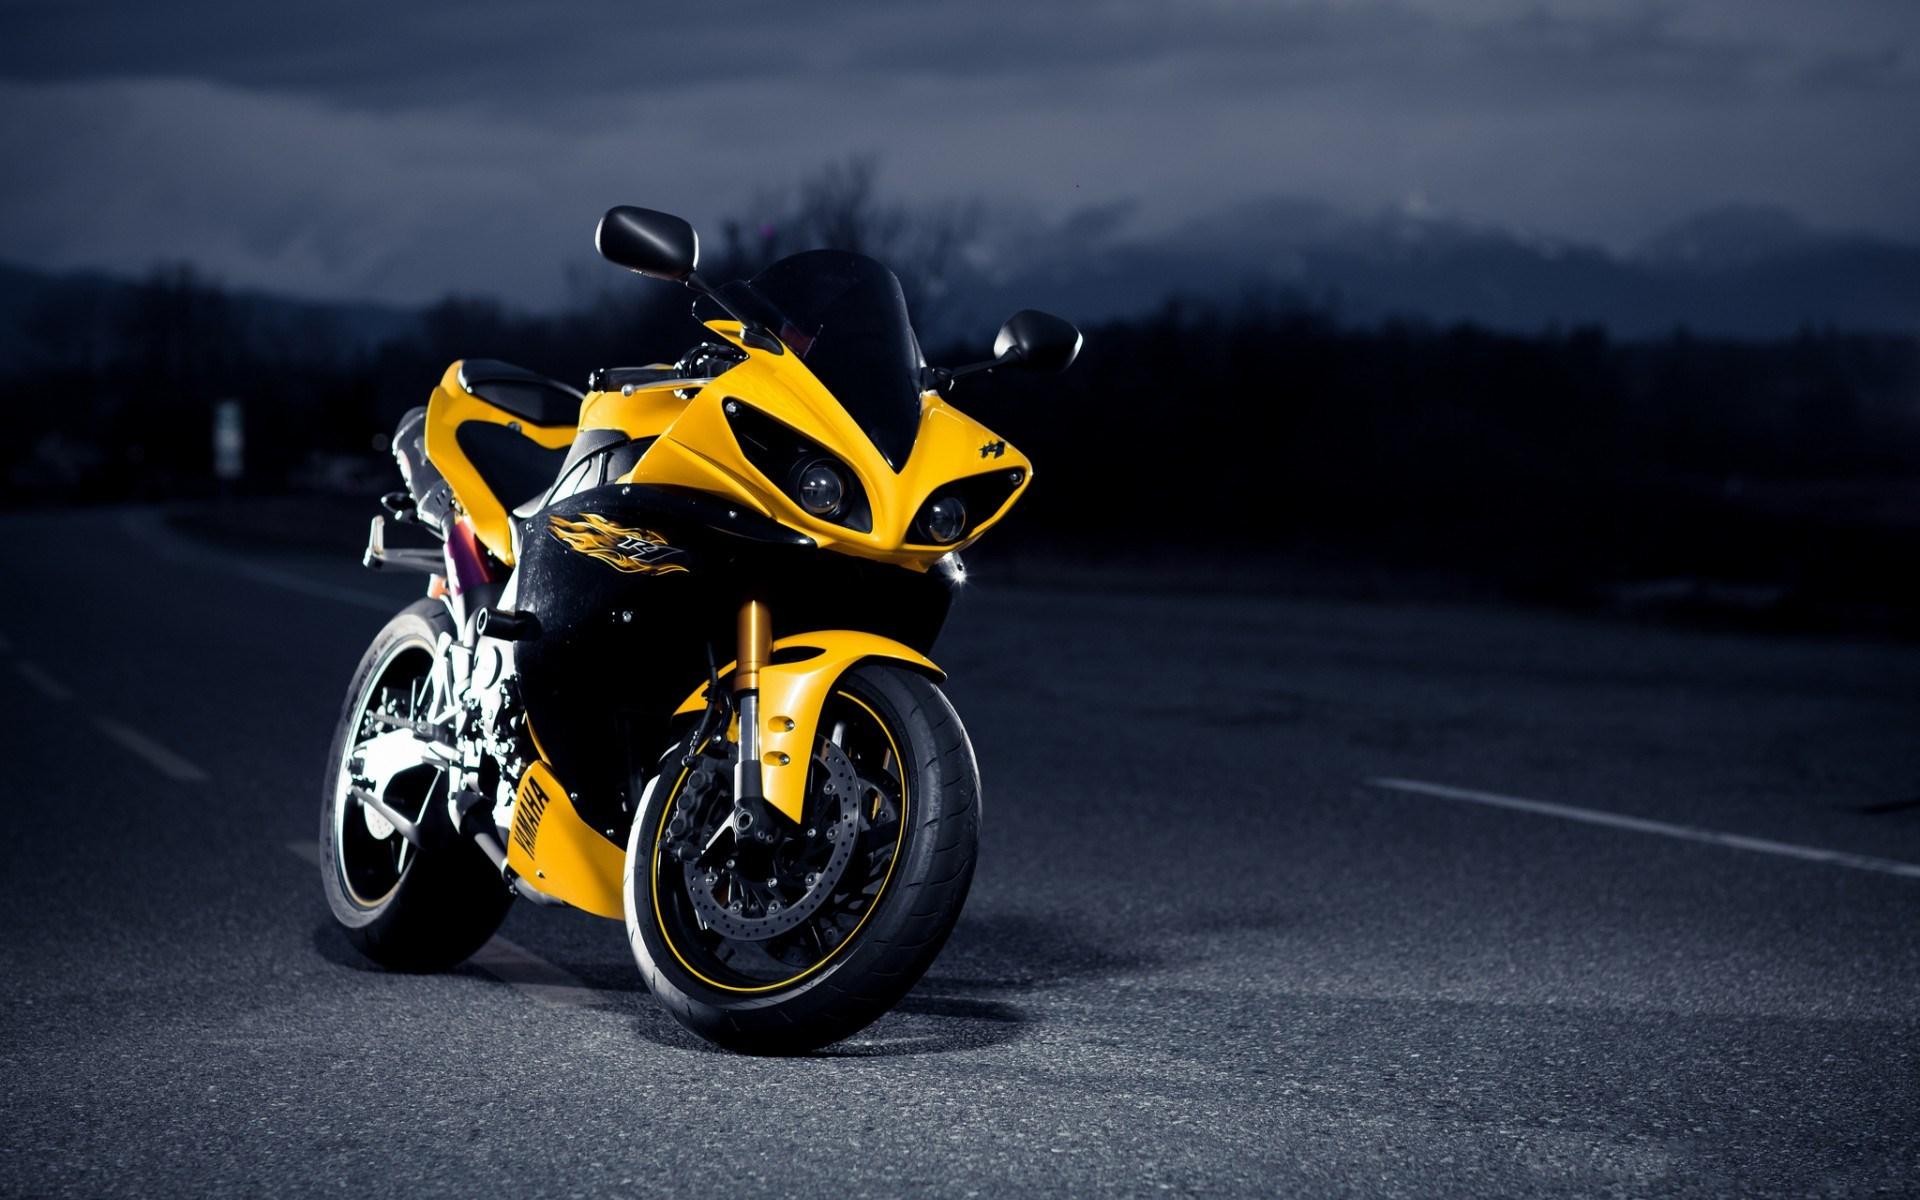 sport superbike motocycle moto wallpaper hd desktop wallpaper hd 1920x1200